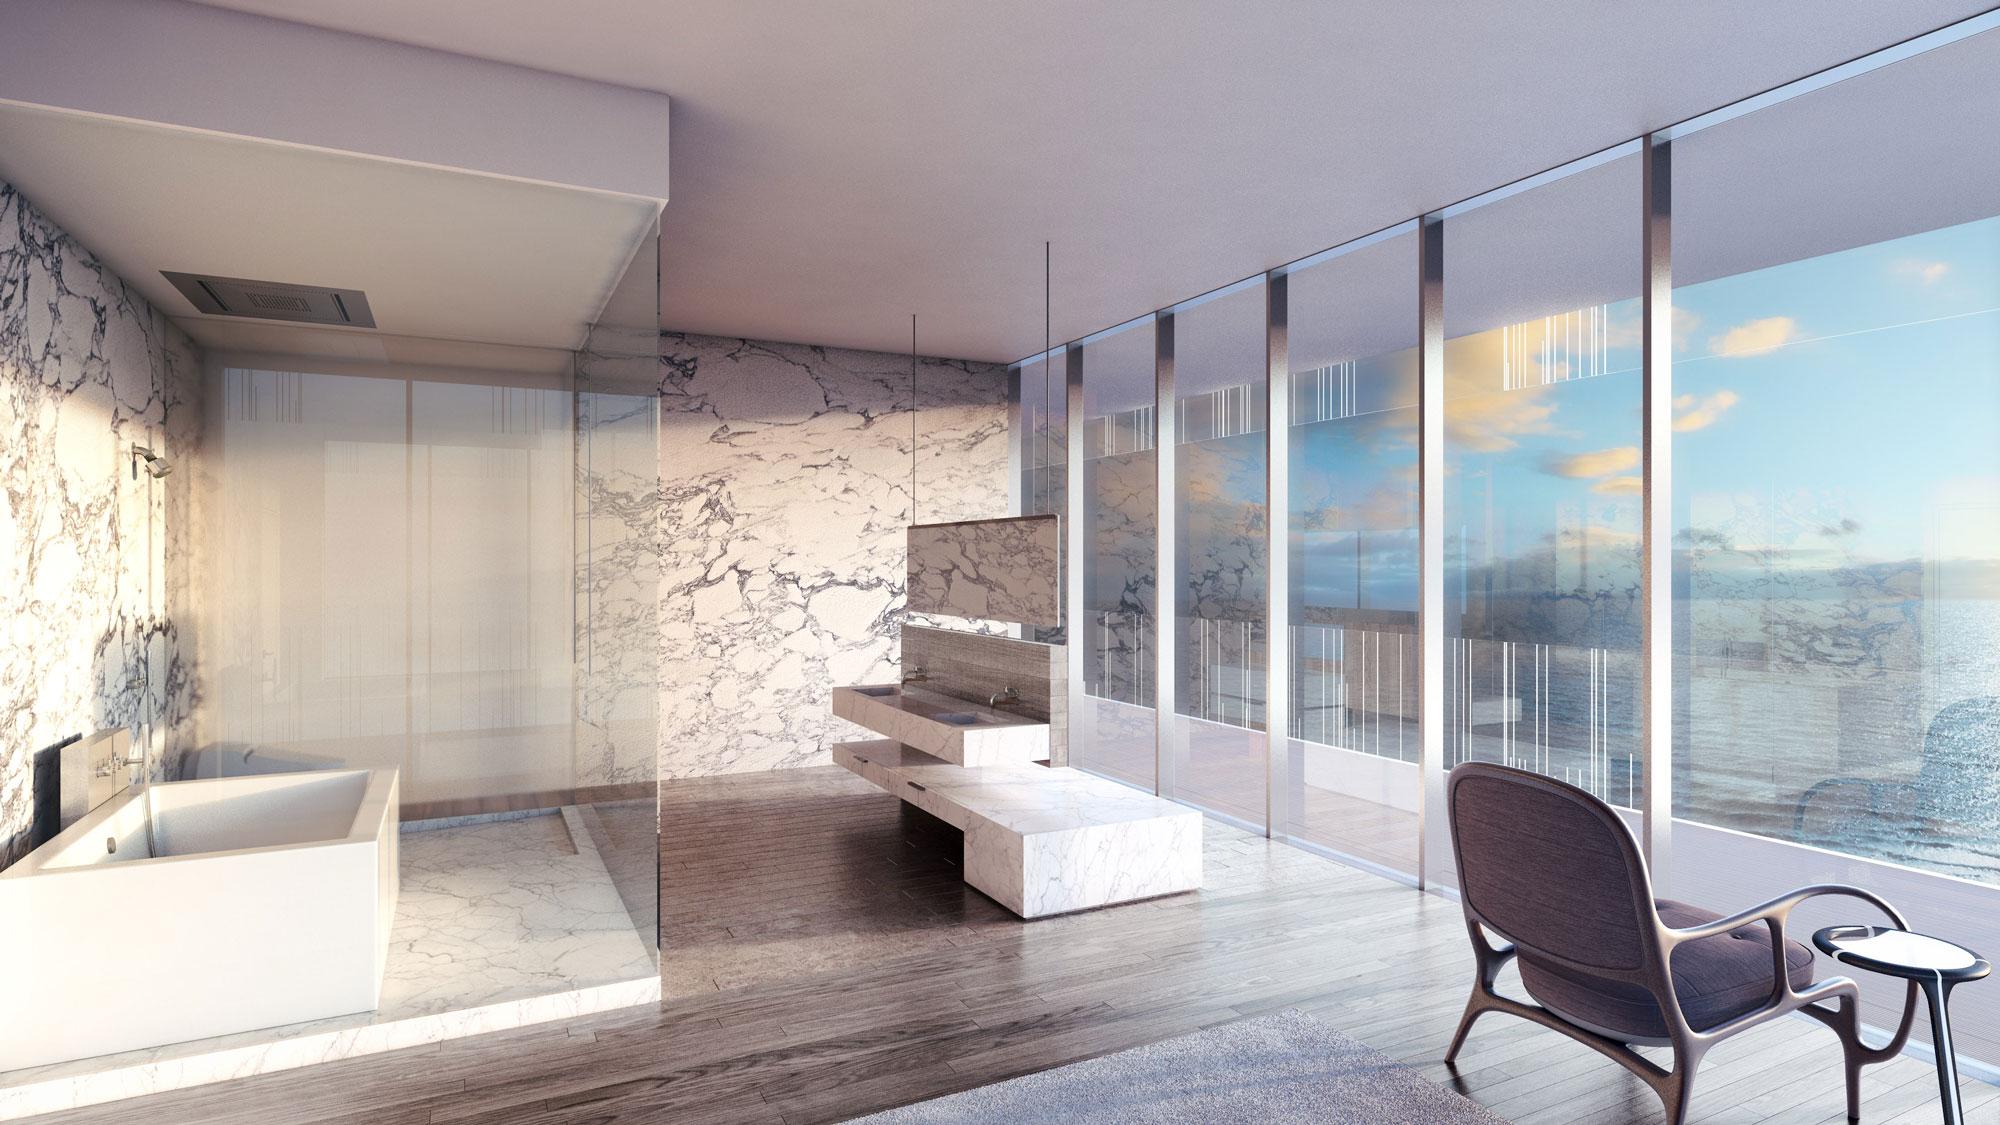 Glass Luxury Condos Bathroom New Build Homesnew Build Homes